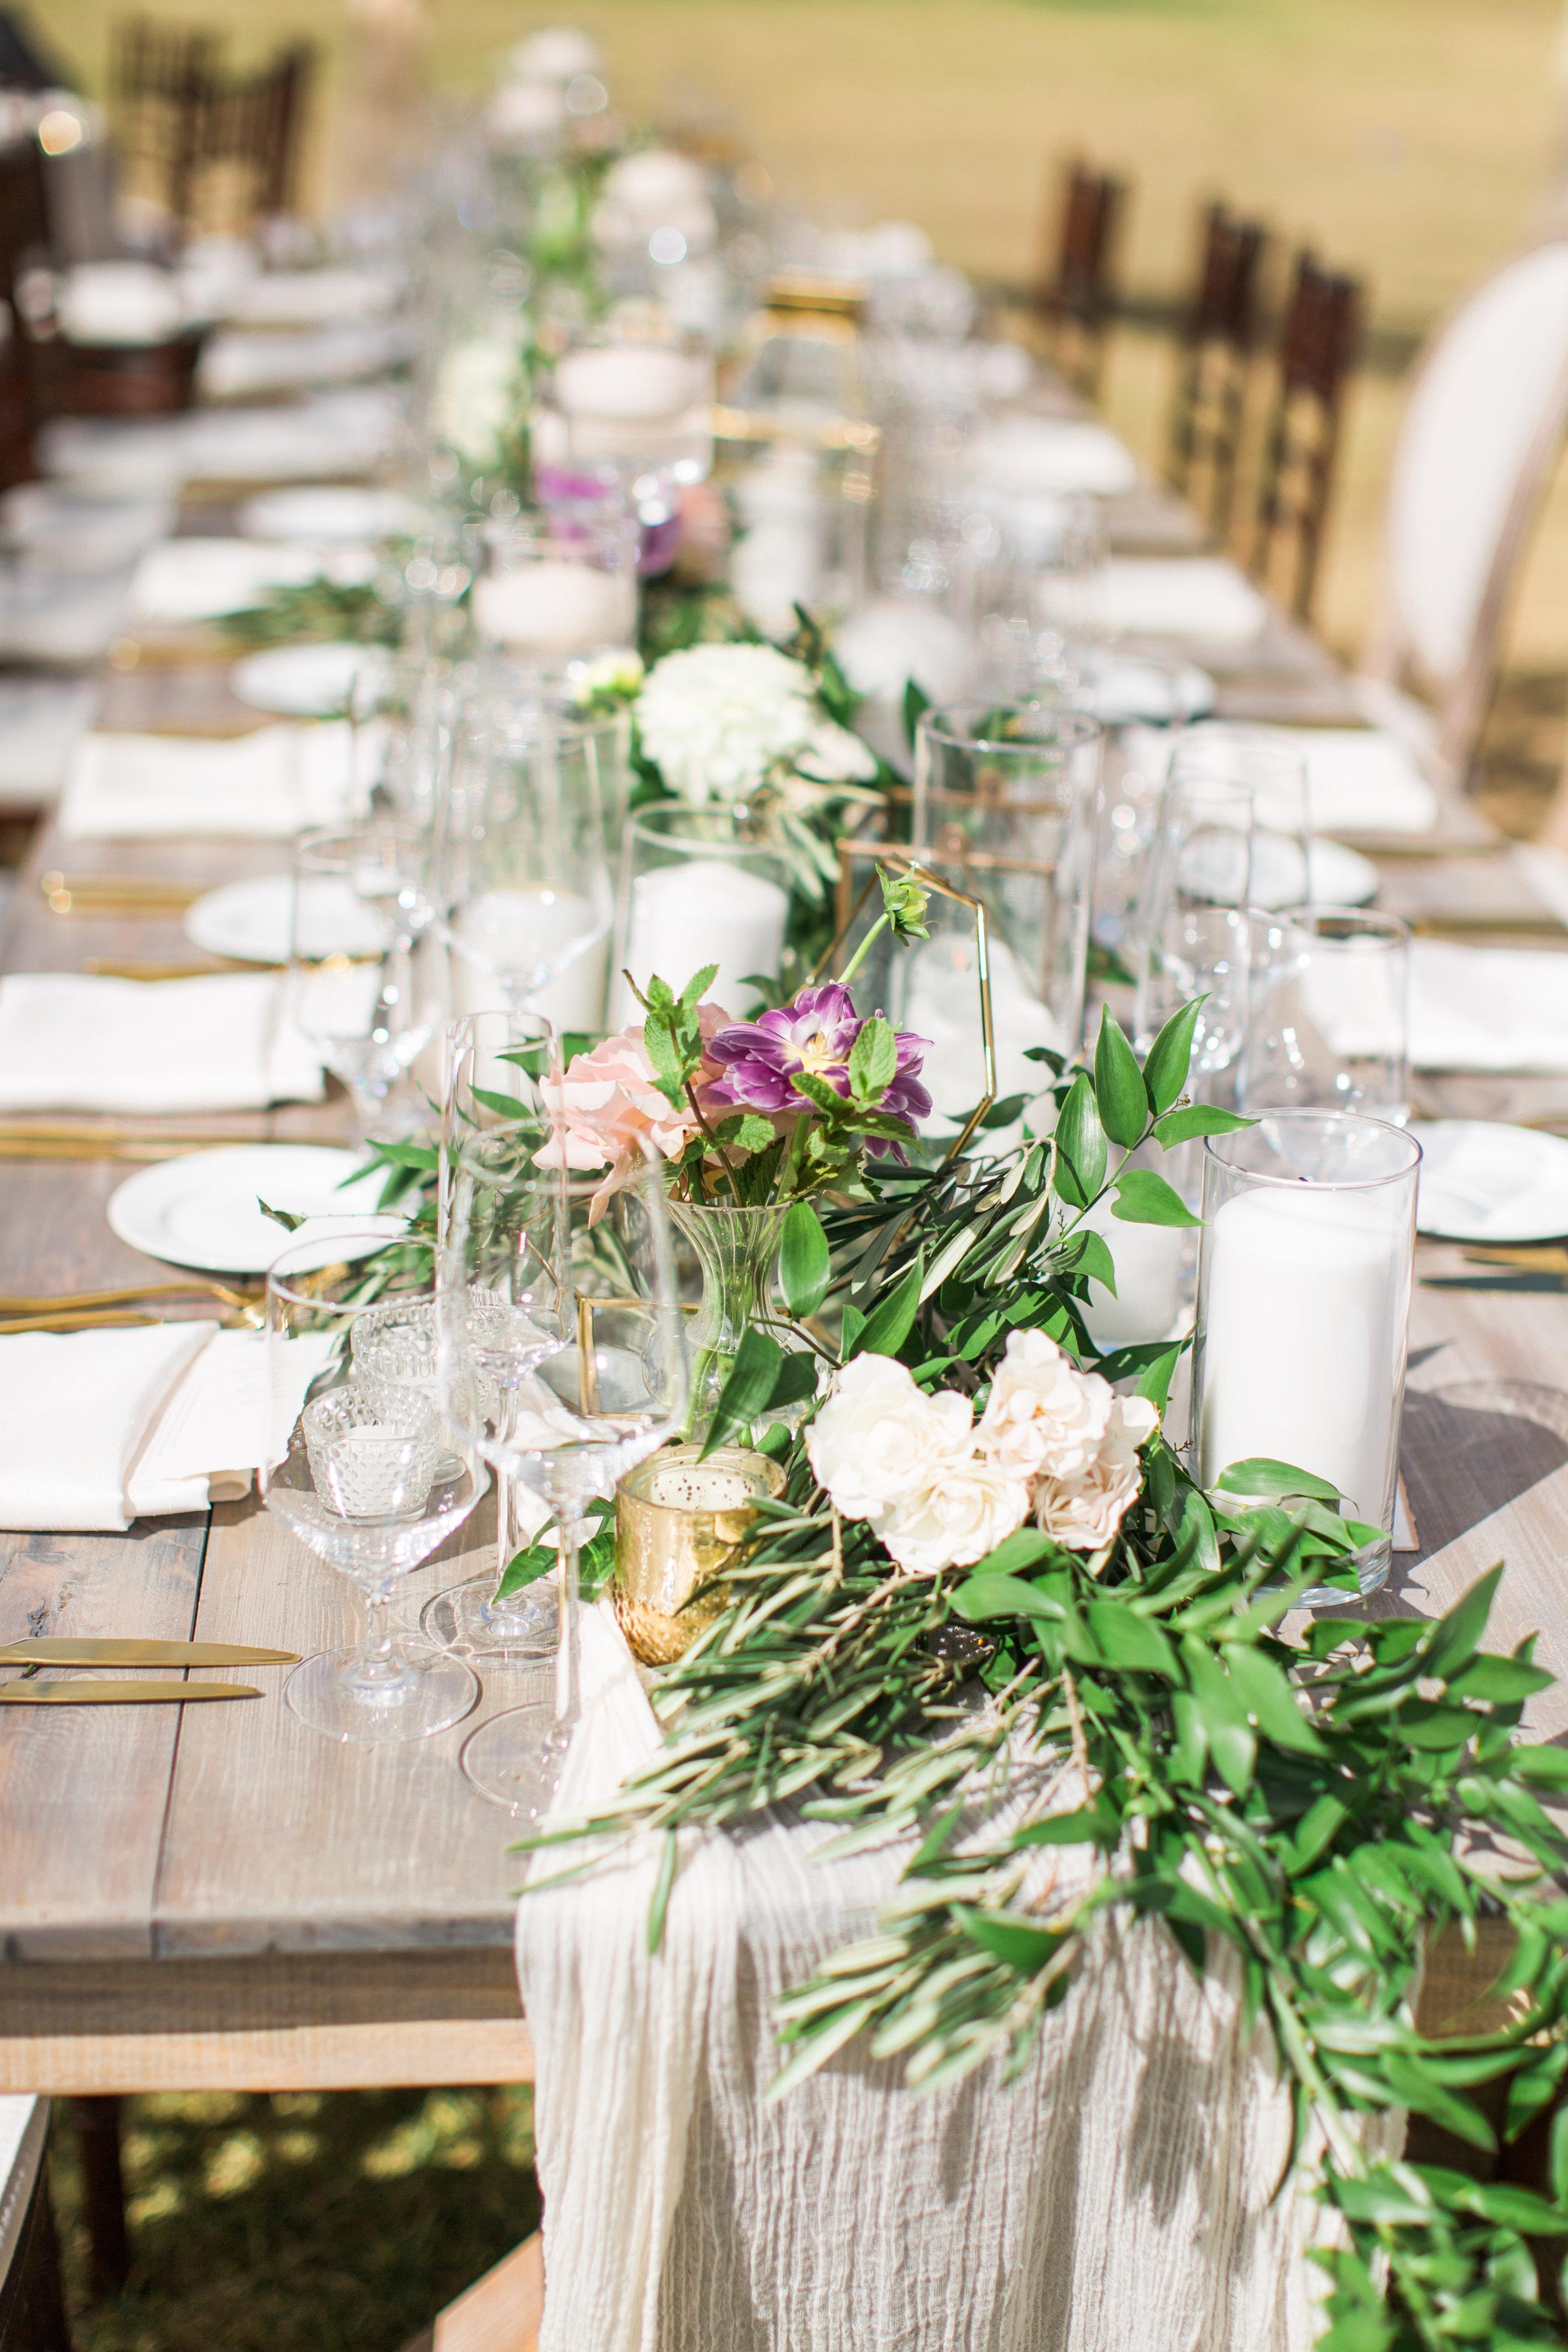 Blooms-breesa-lee-luxury-florist-aga-jones-tres-chic-affairs-san-diego-wedding-classic-coast-catering-58).jpg